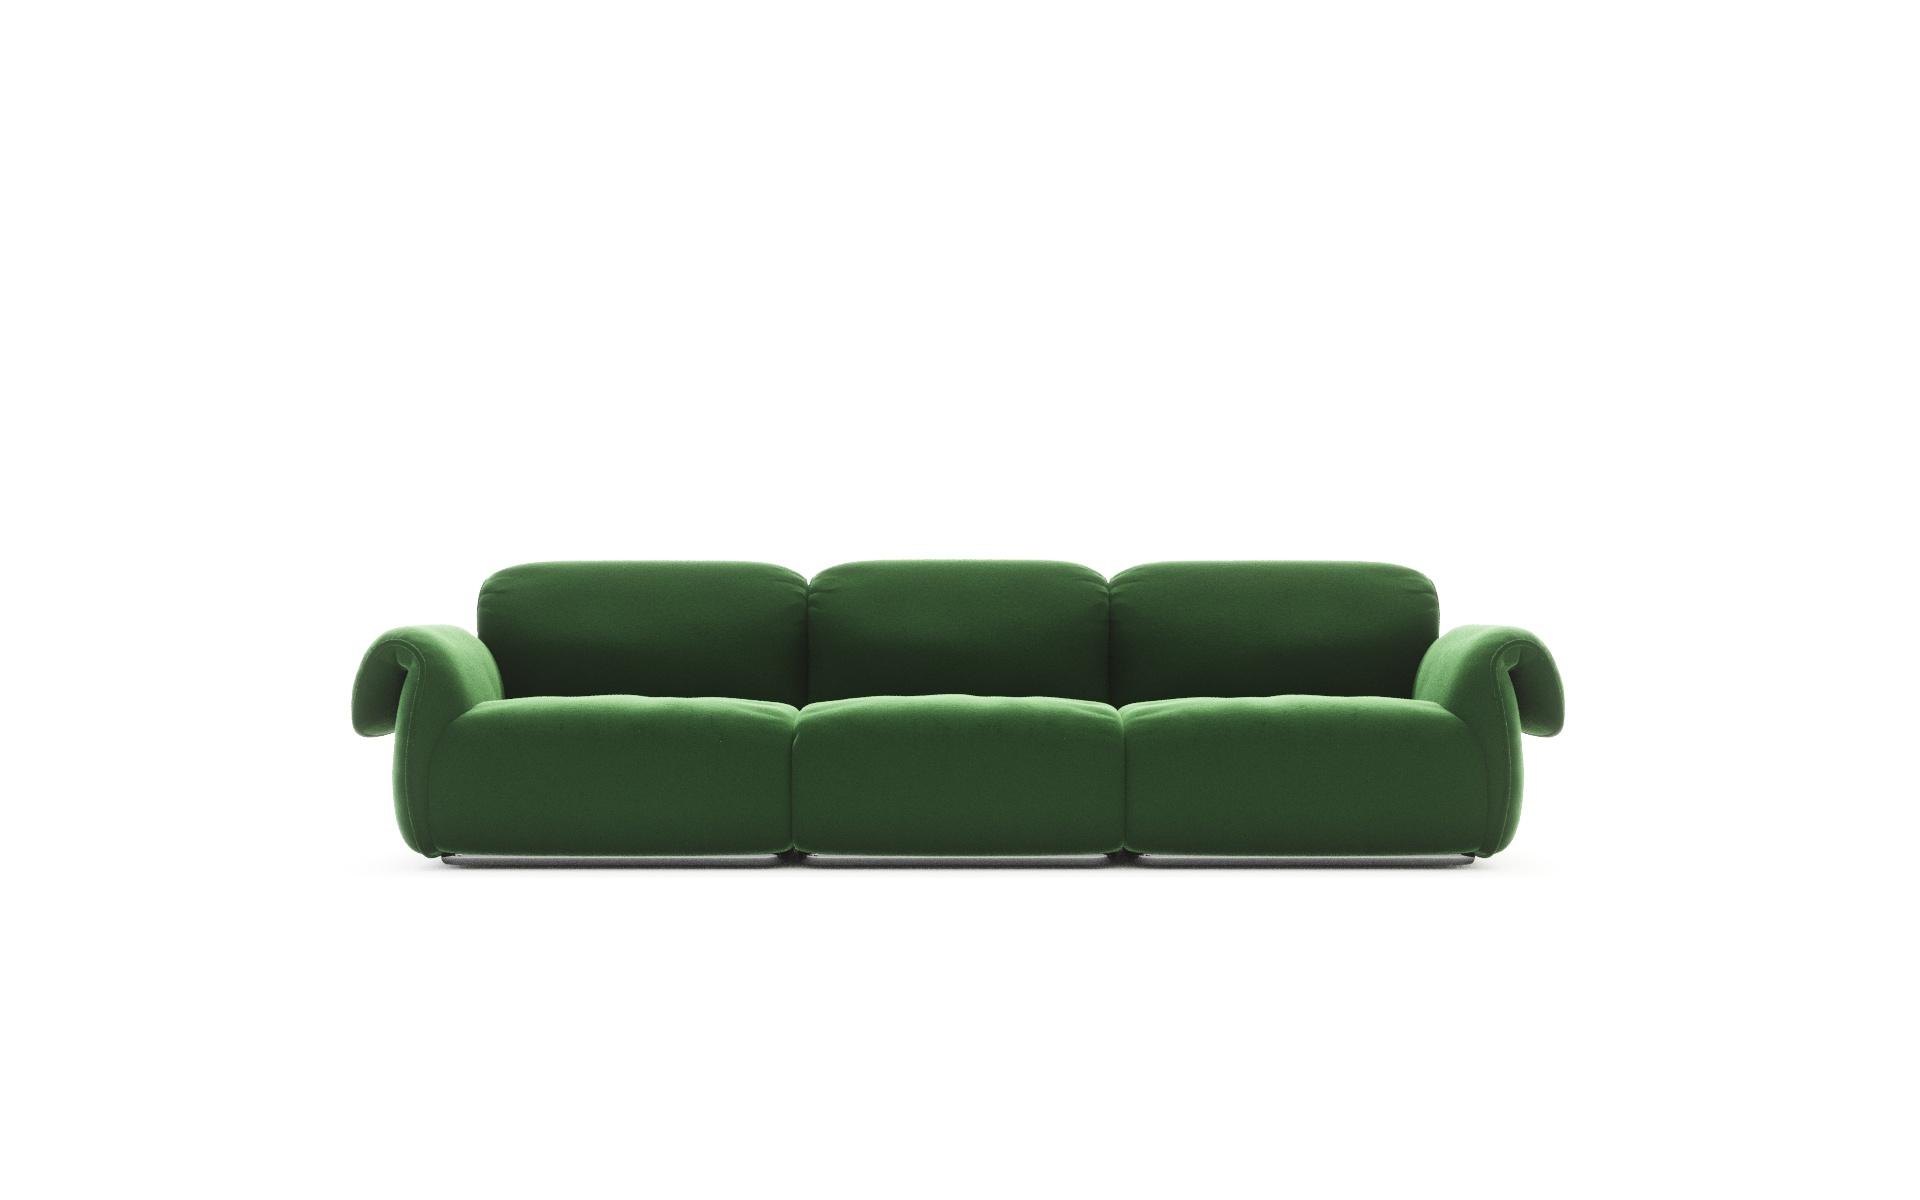 ciak sofa natuzzi gus modern clinton sectional michele menescardi designer industrial design studio